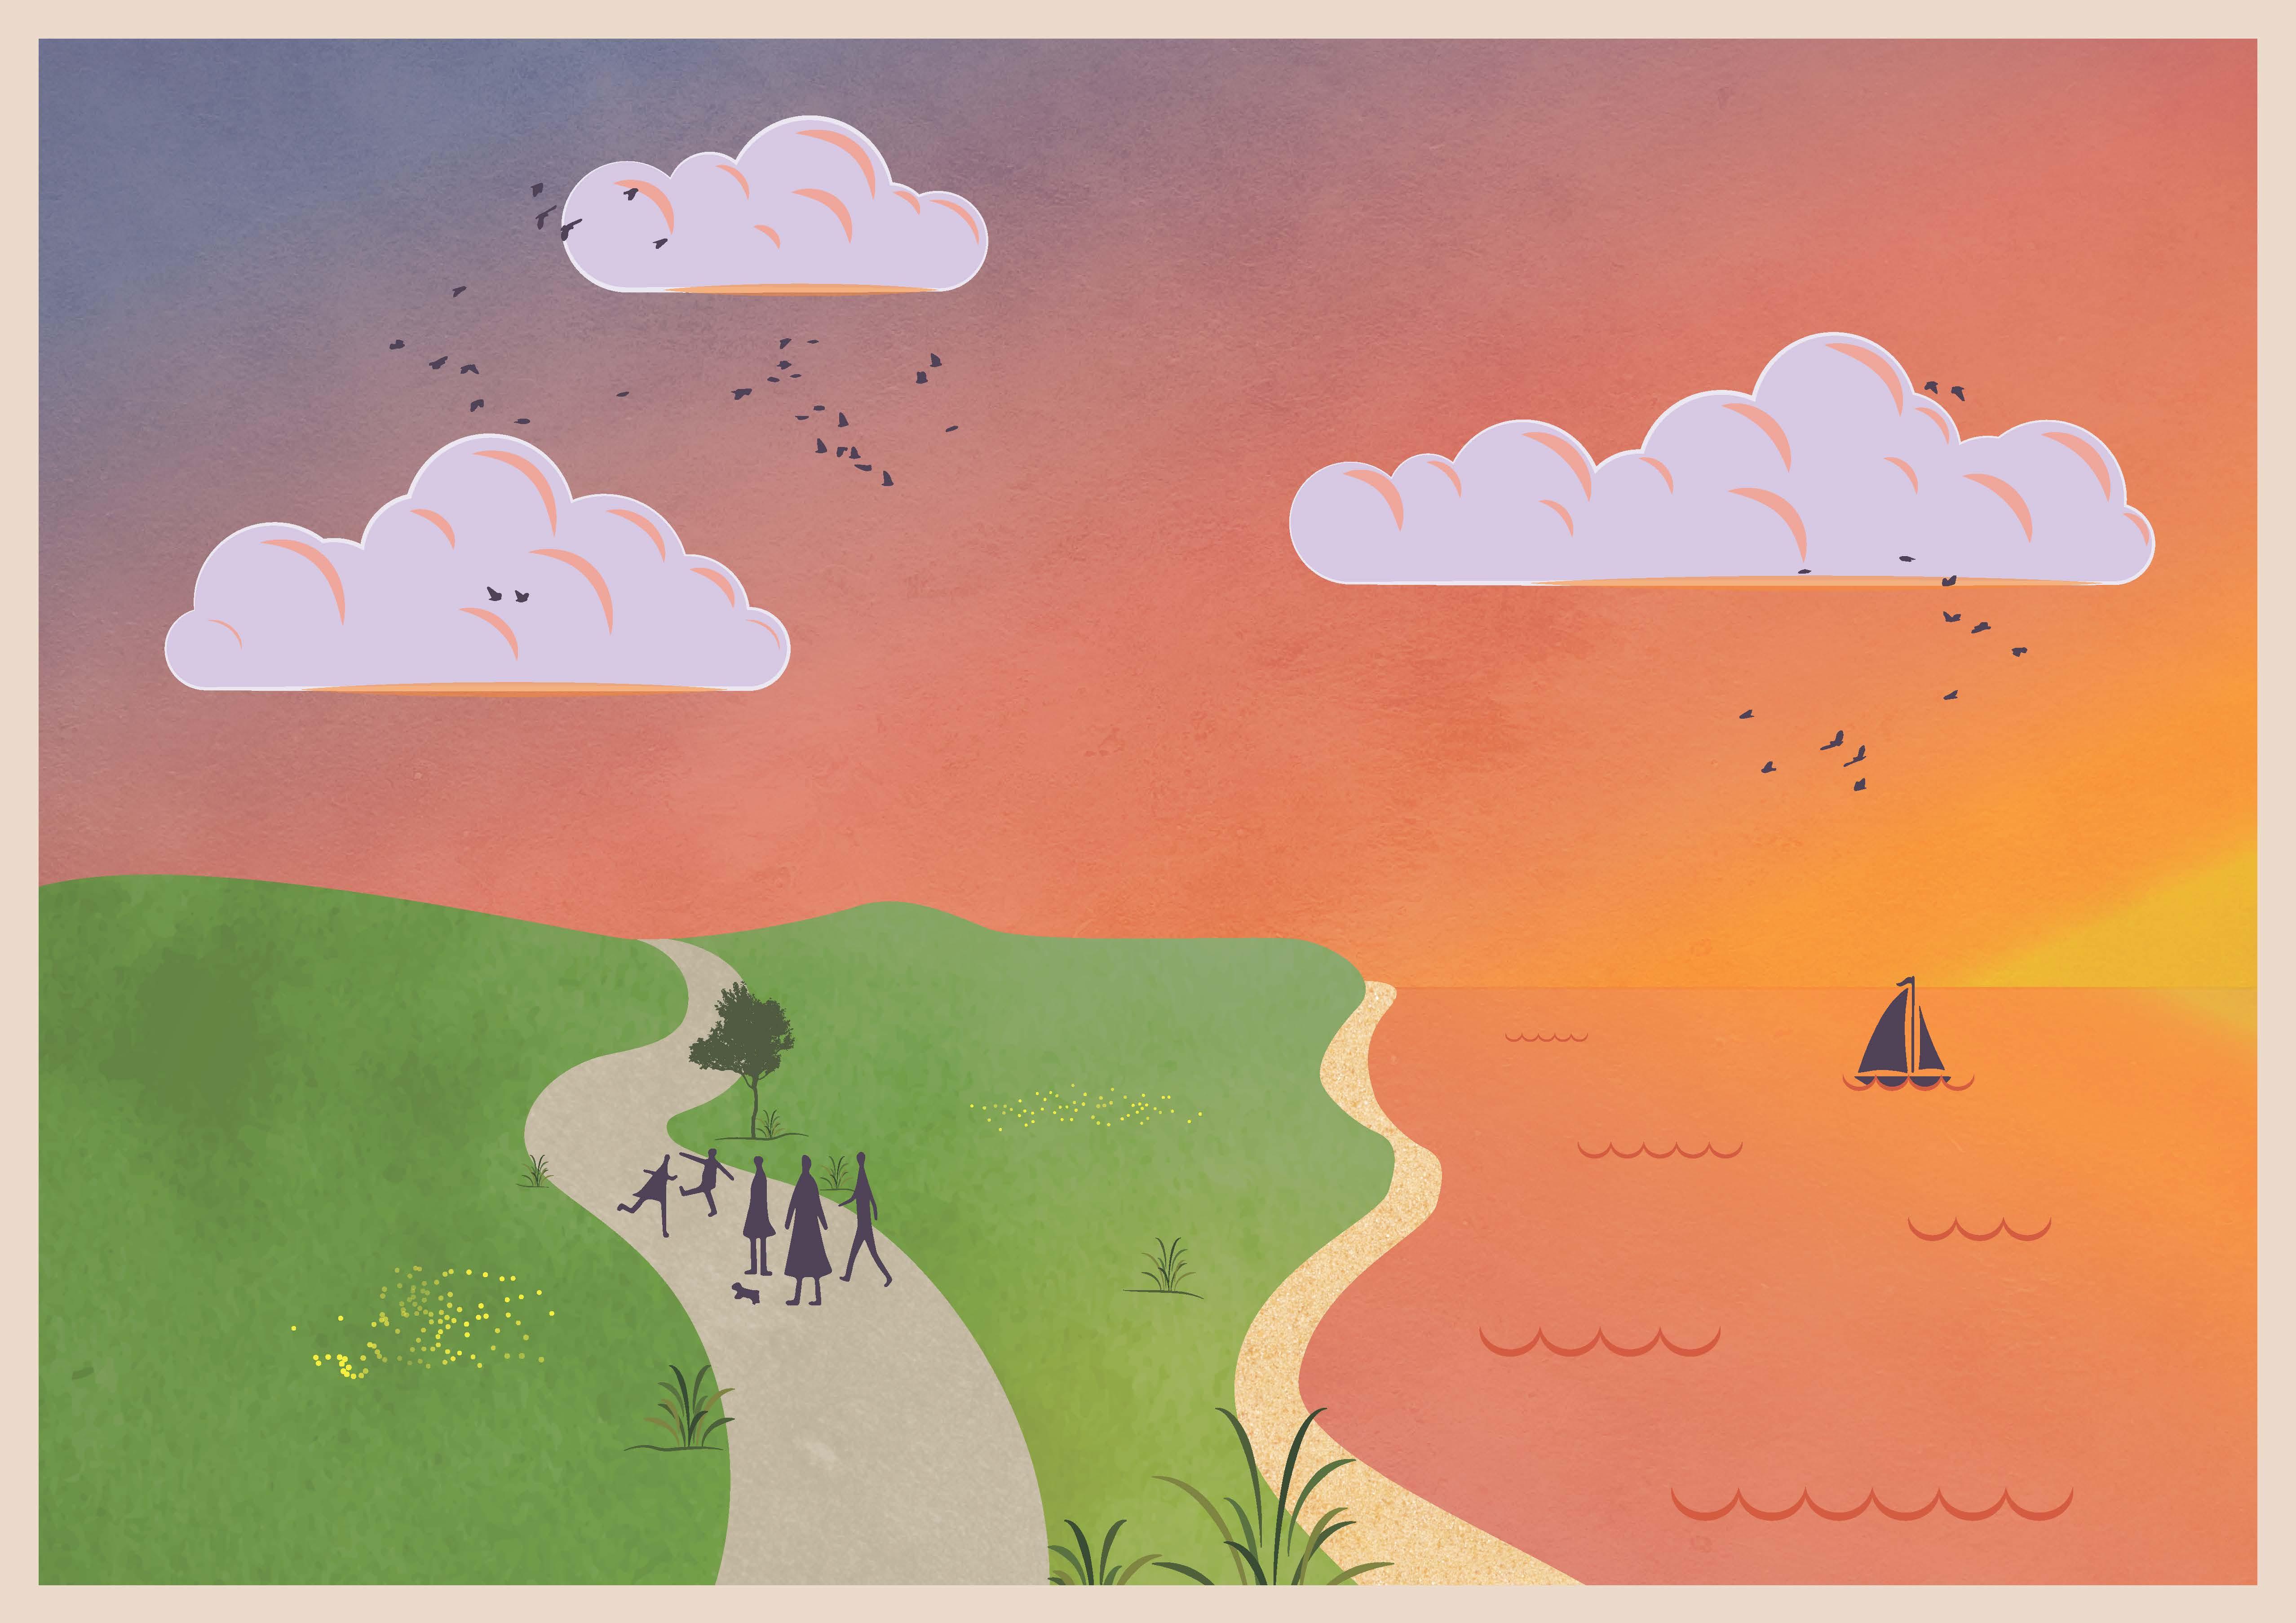 Elise Illustration